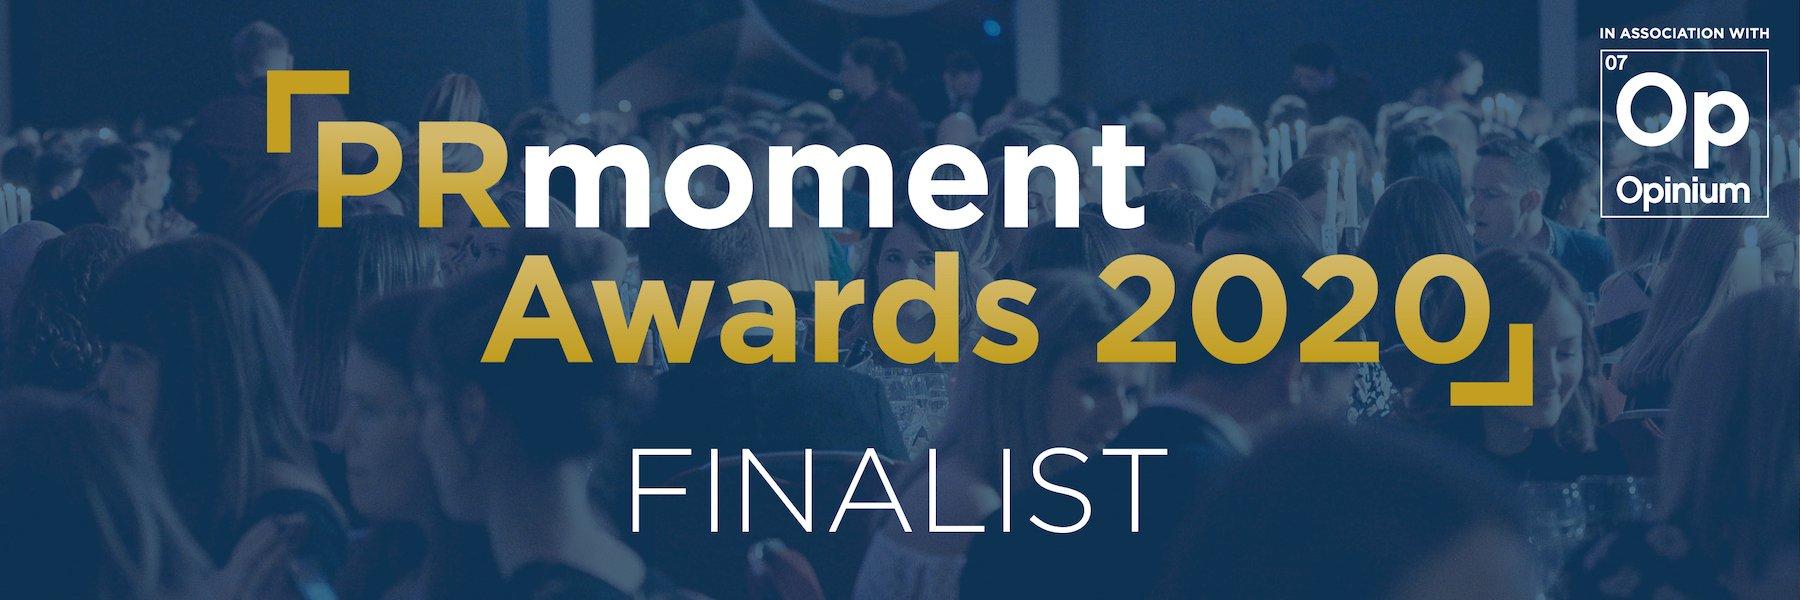 PRMoment20 Finalist Banner